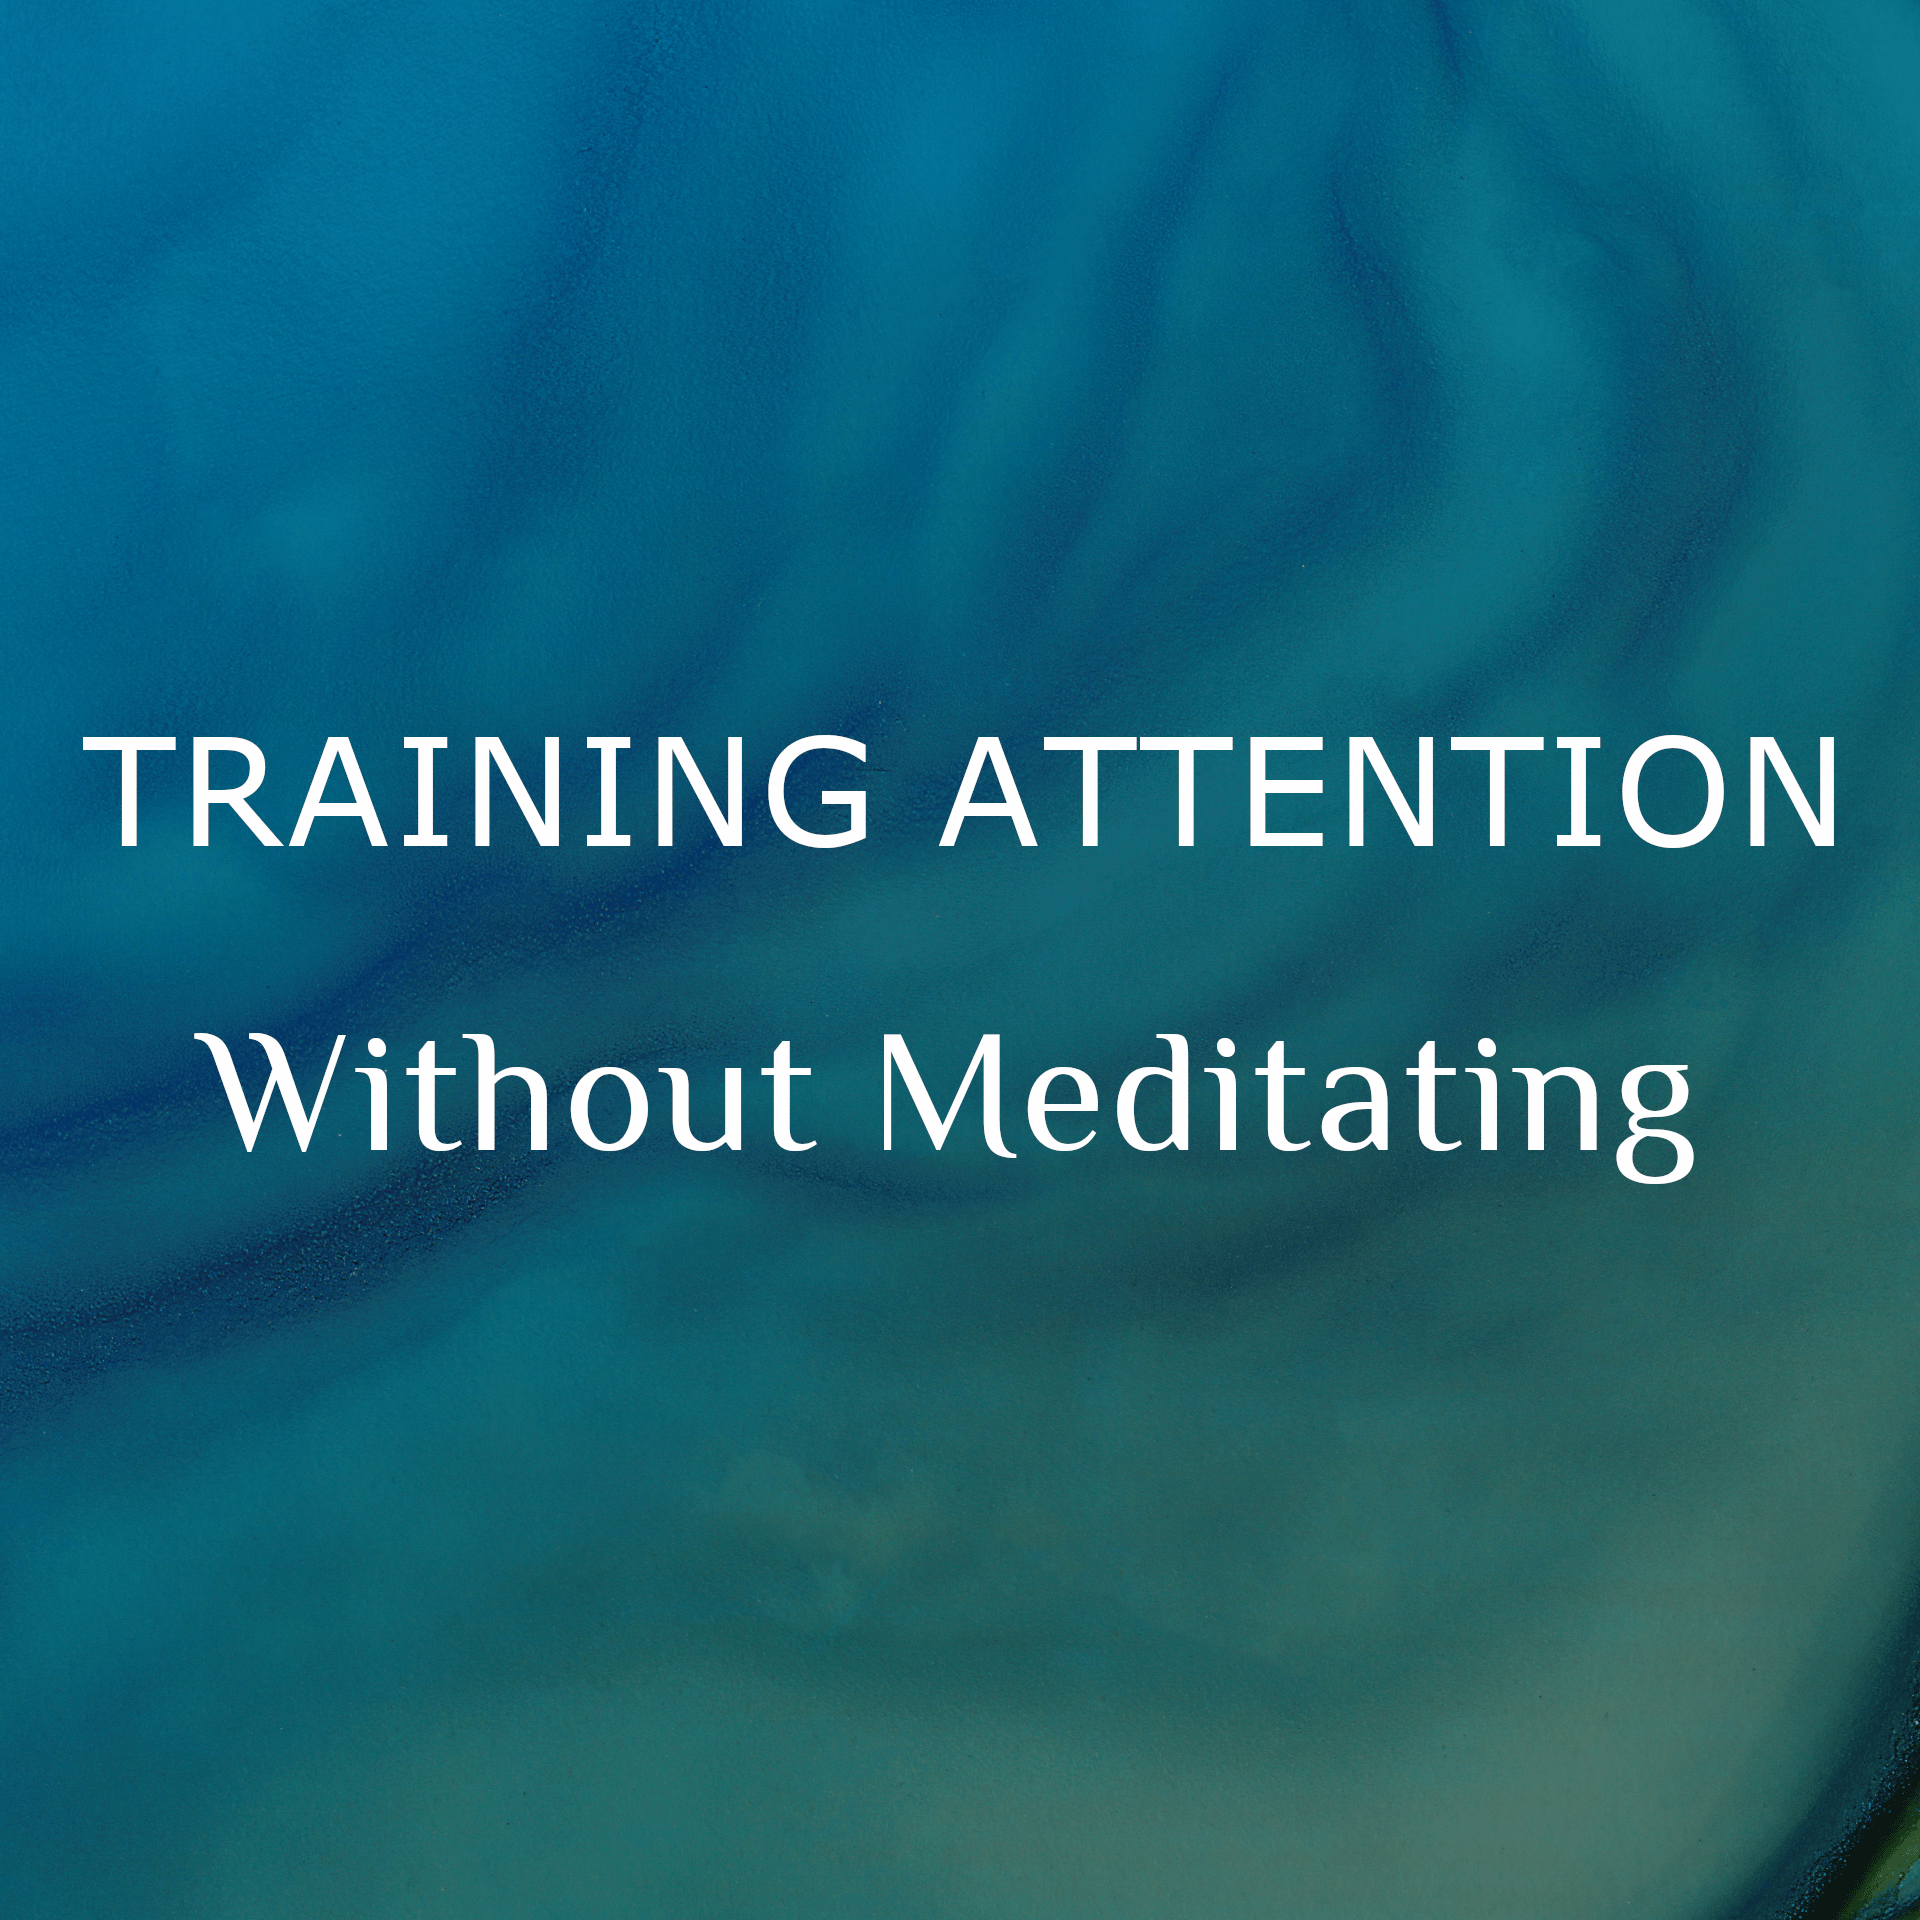 Training Attention